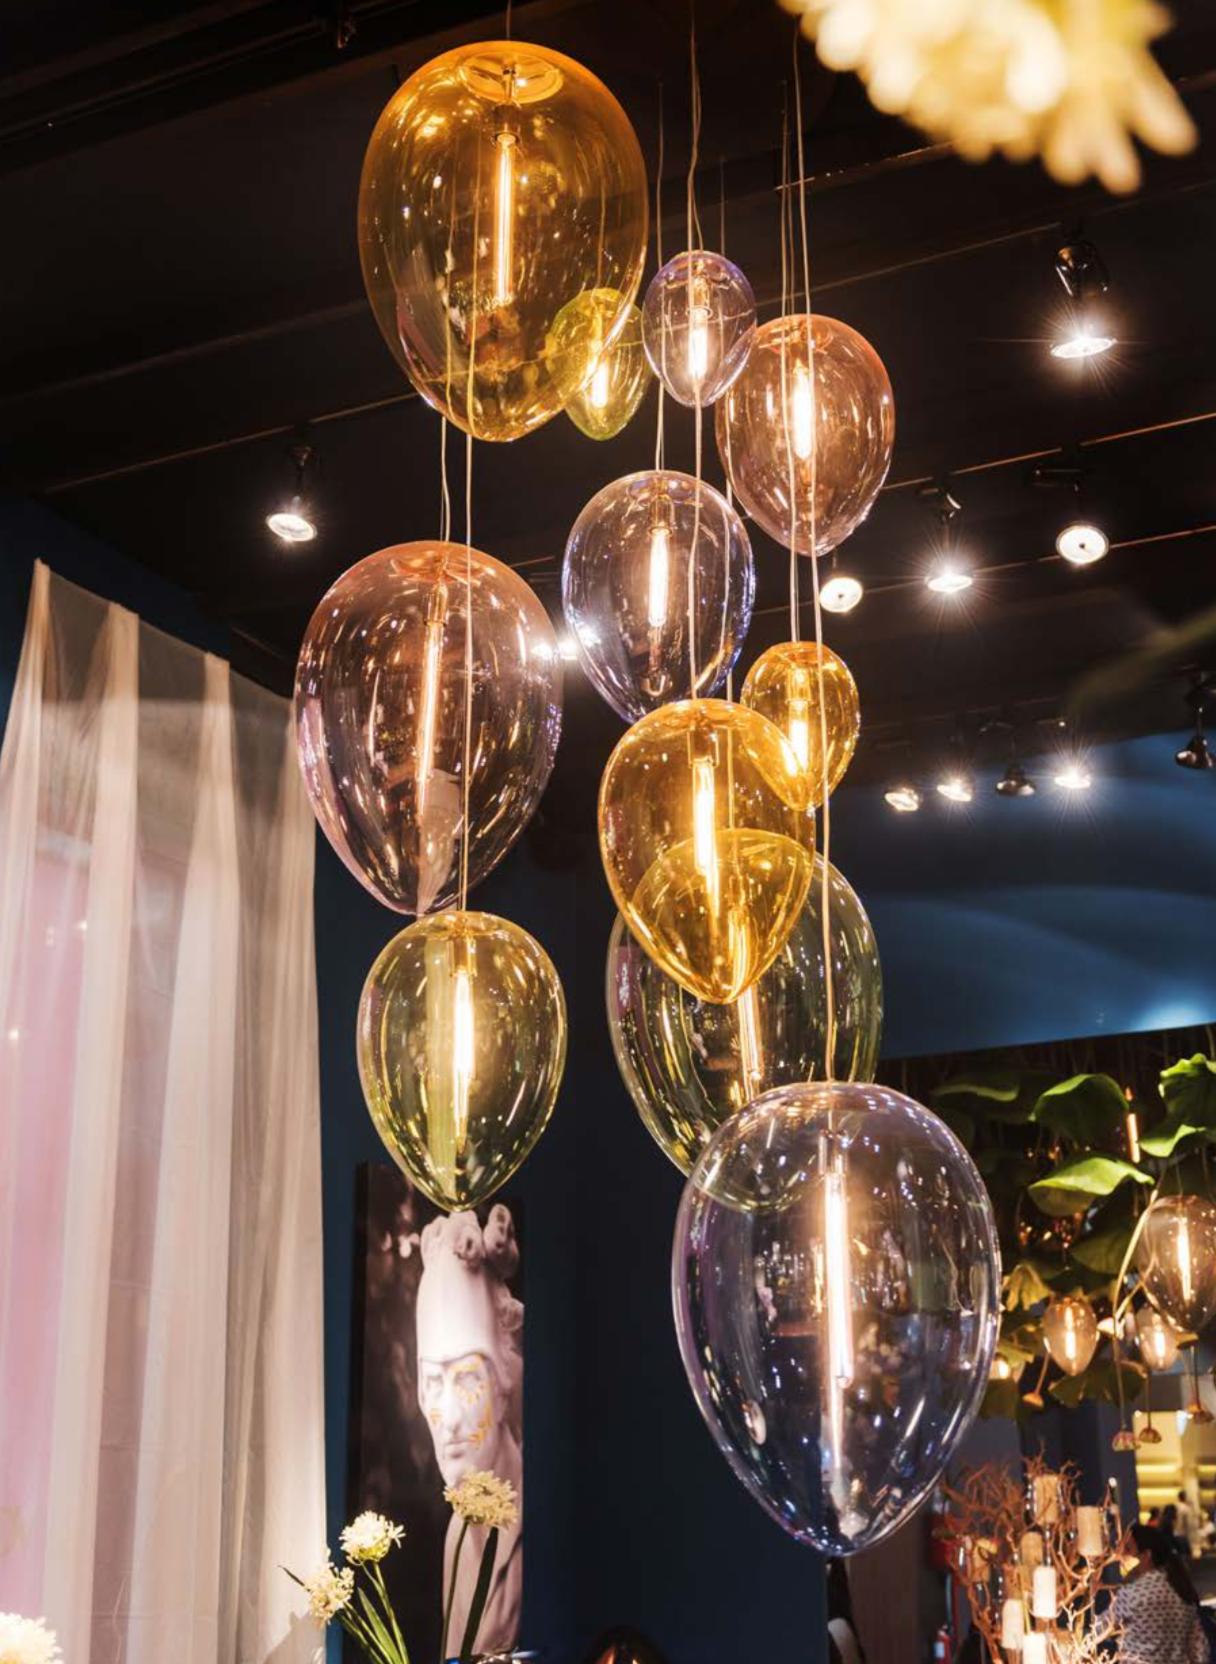 VG New Trend New Egg collection - Masha Shapiro Agency UK.png